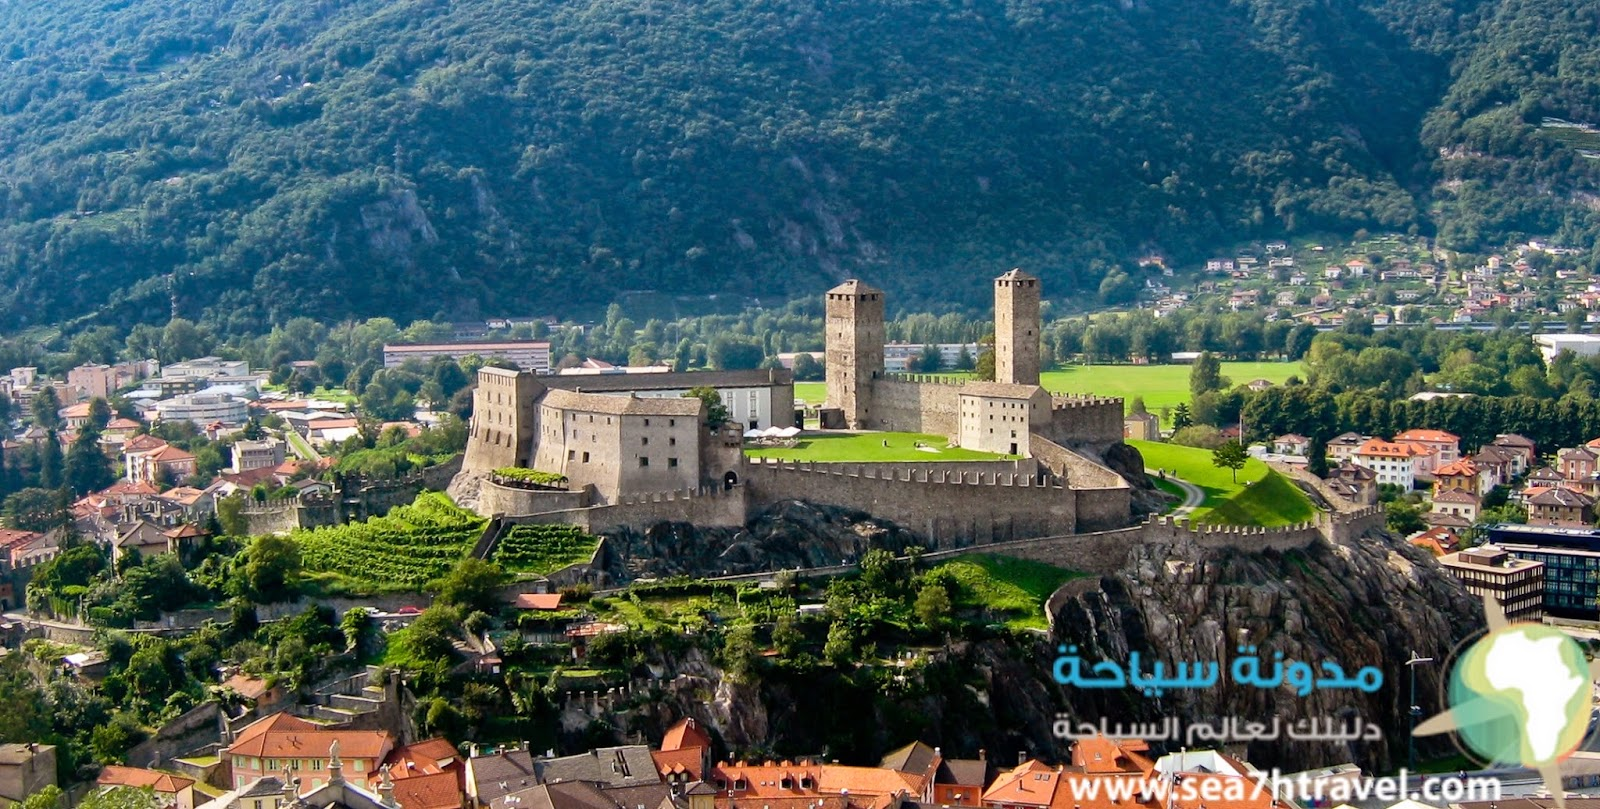 قلعة كاستلغراندي Castelgrande